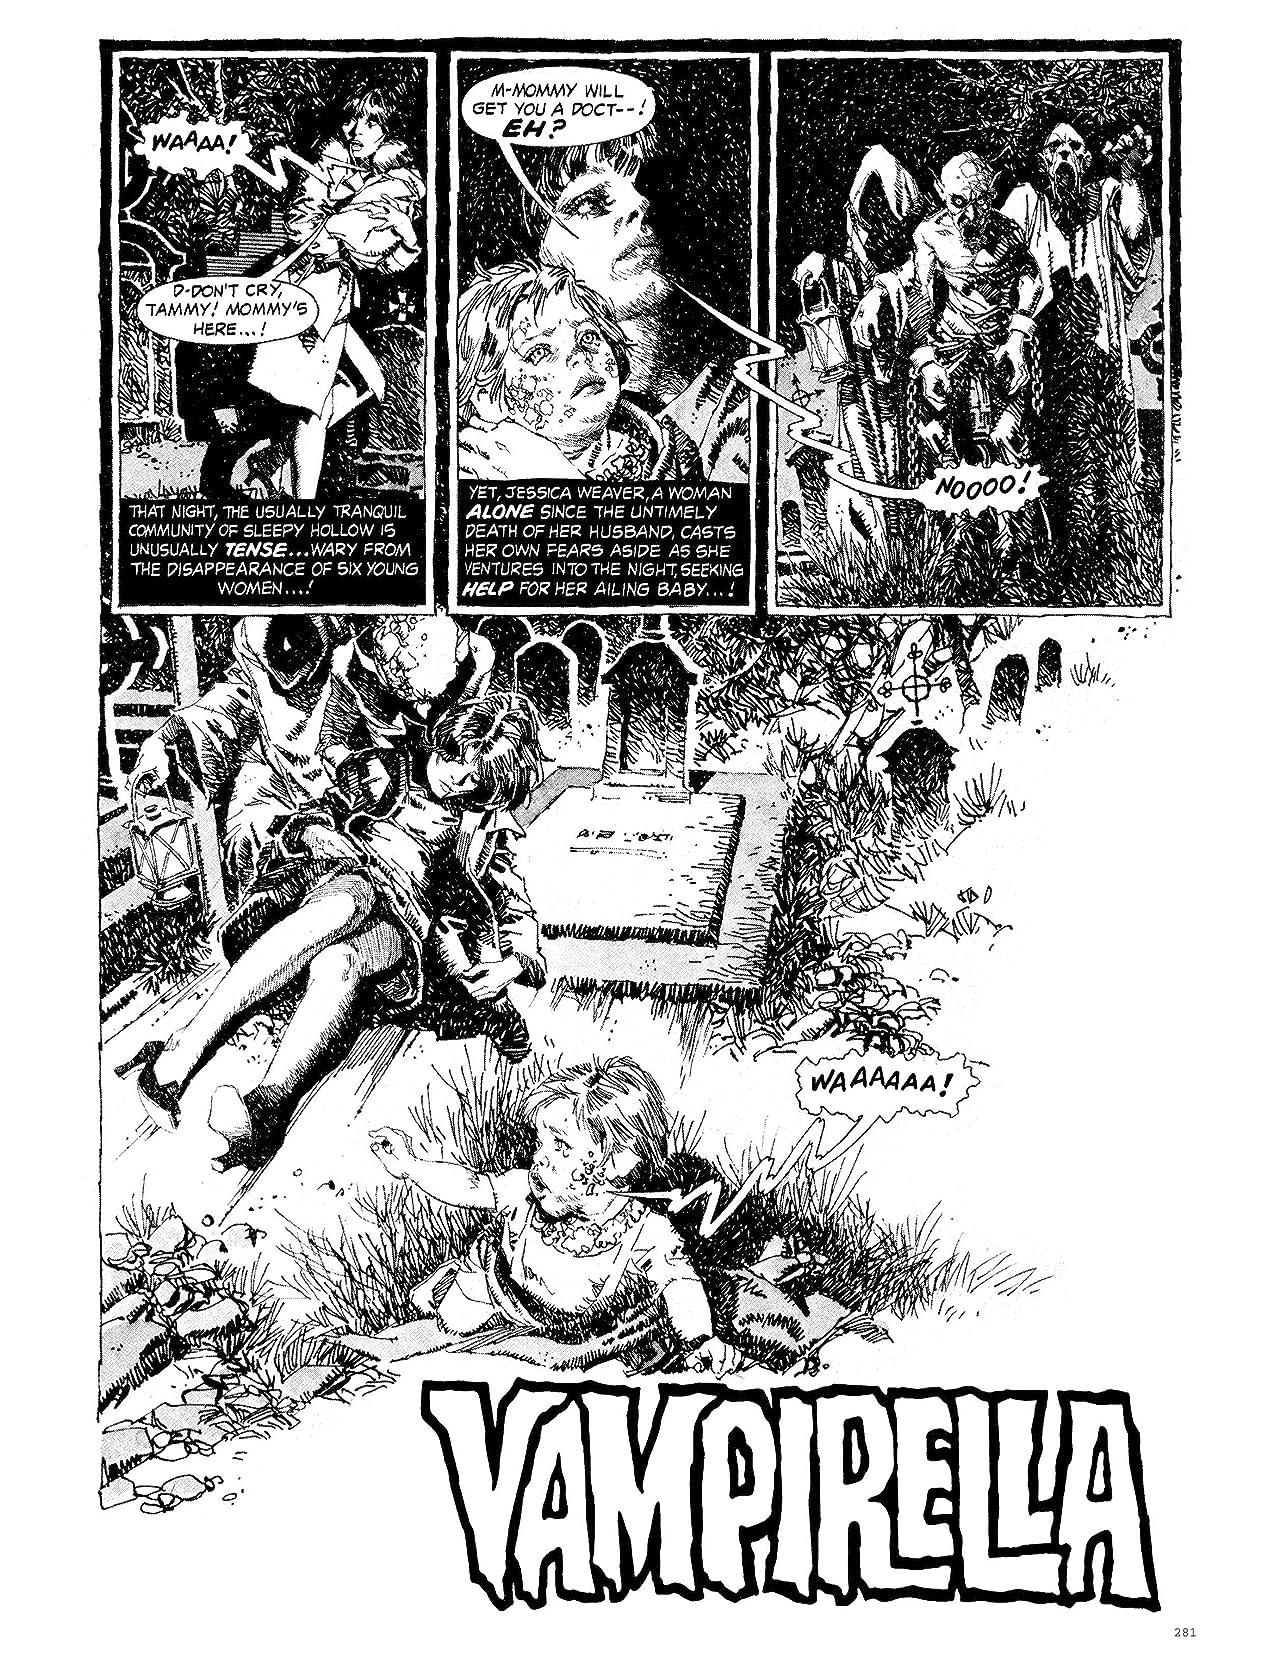 Vampirella (Magazine 1969-1983) #56